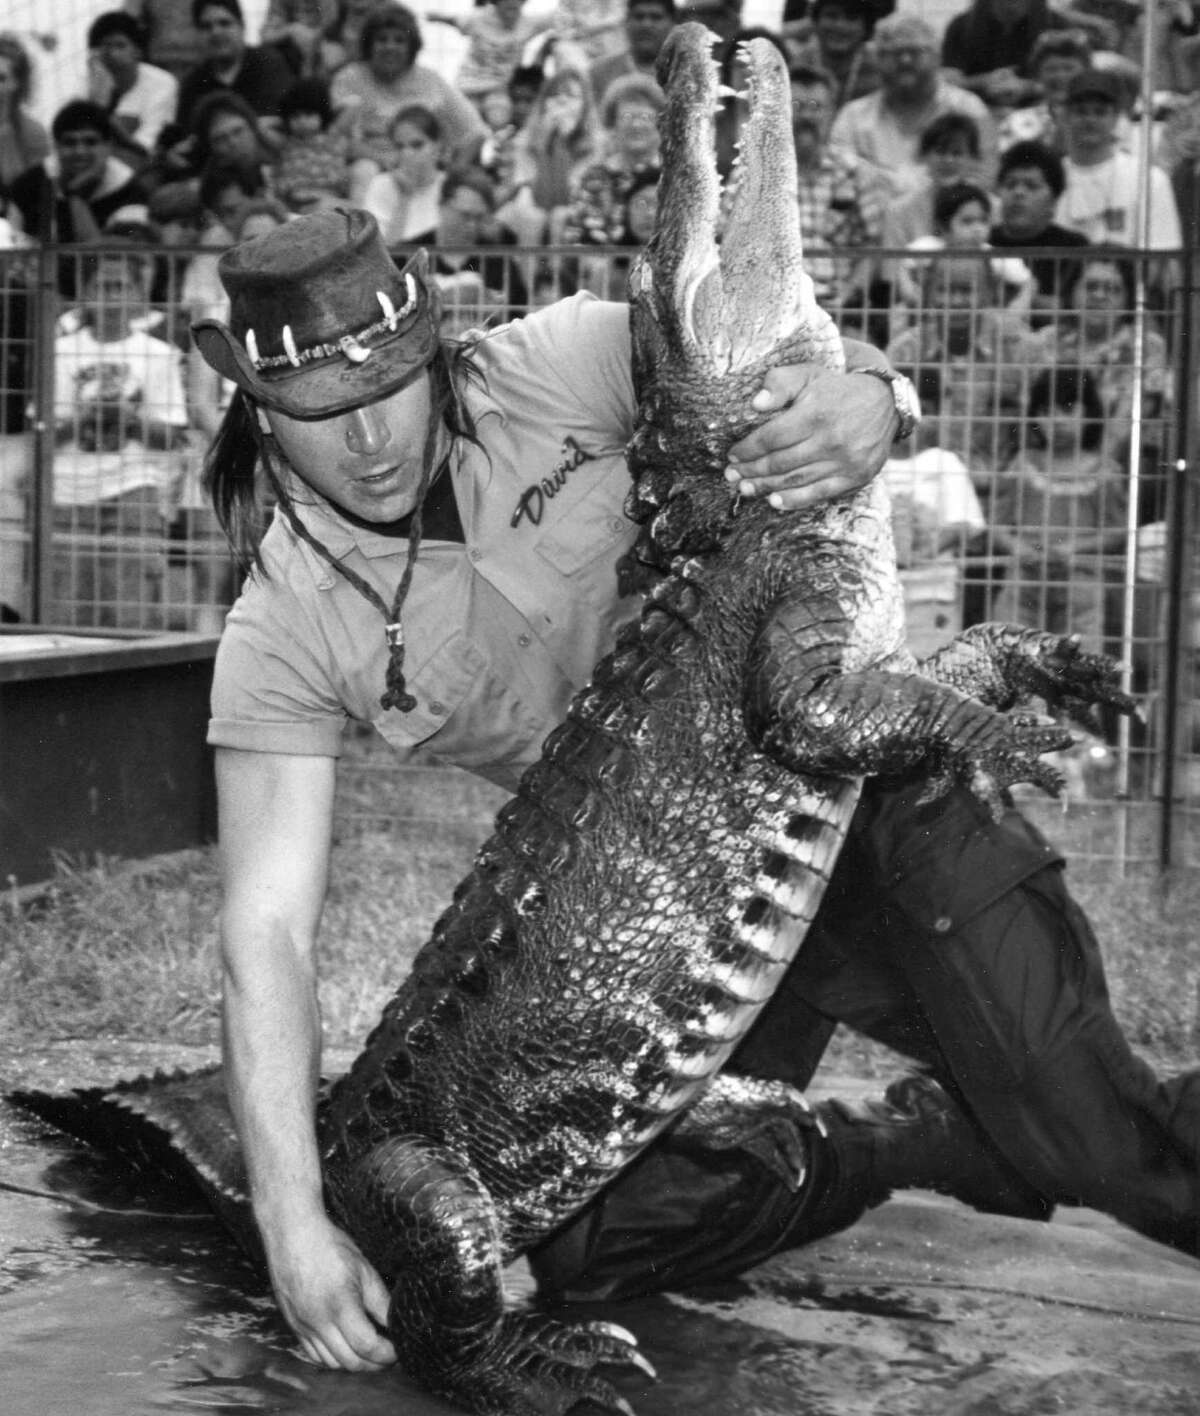 David Castillo of Sunken Garden, FL, holds an alligator during the